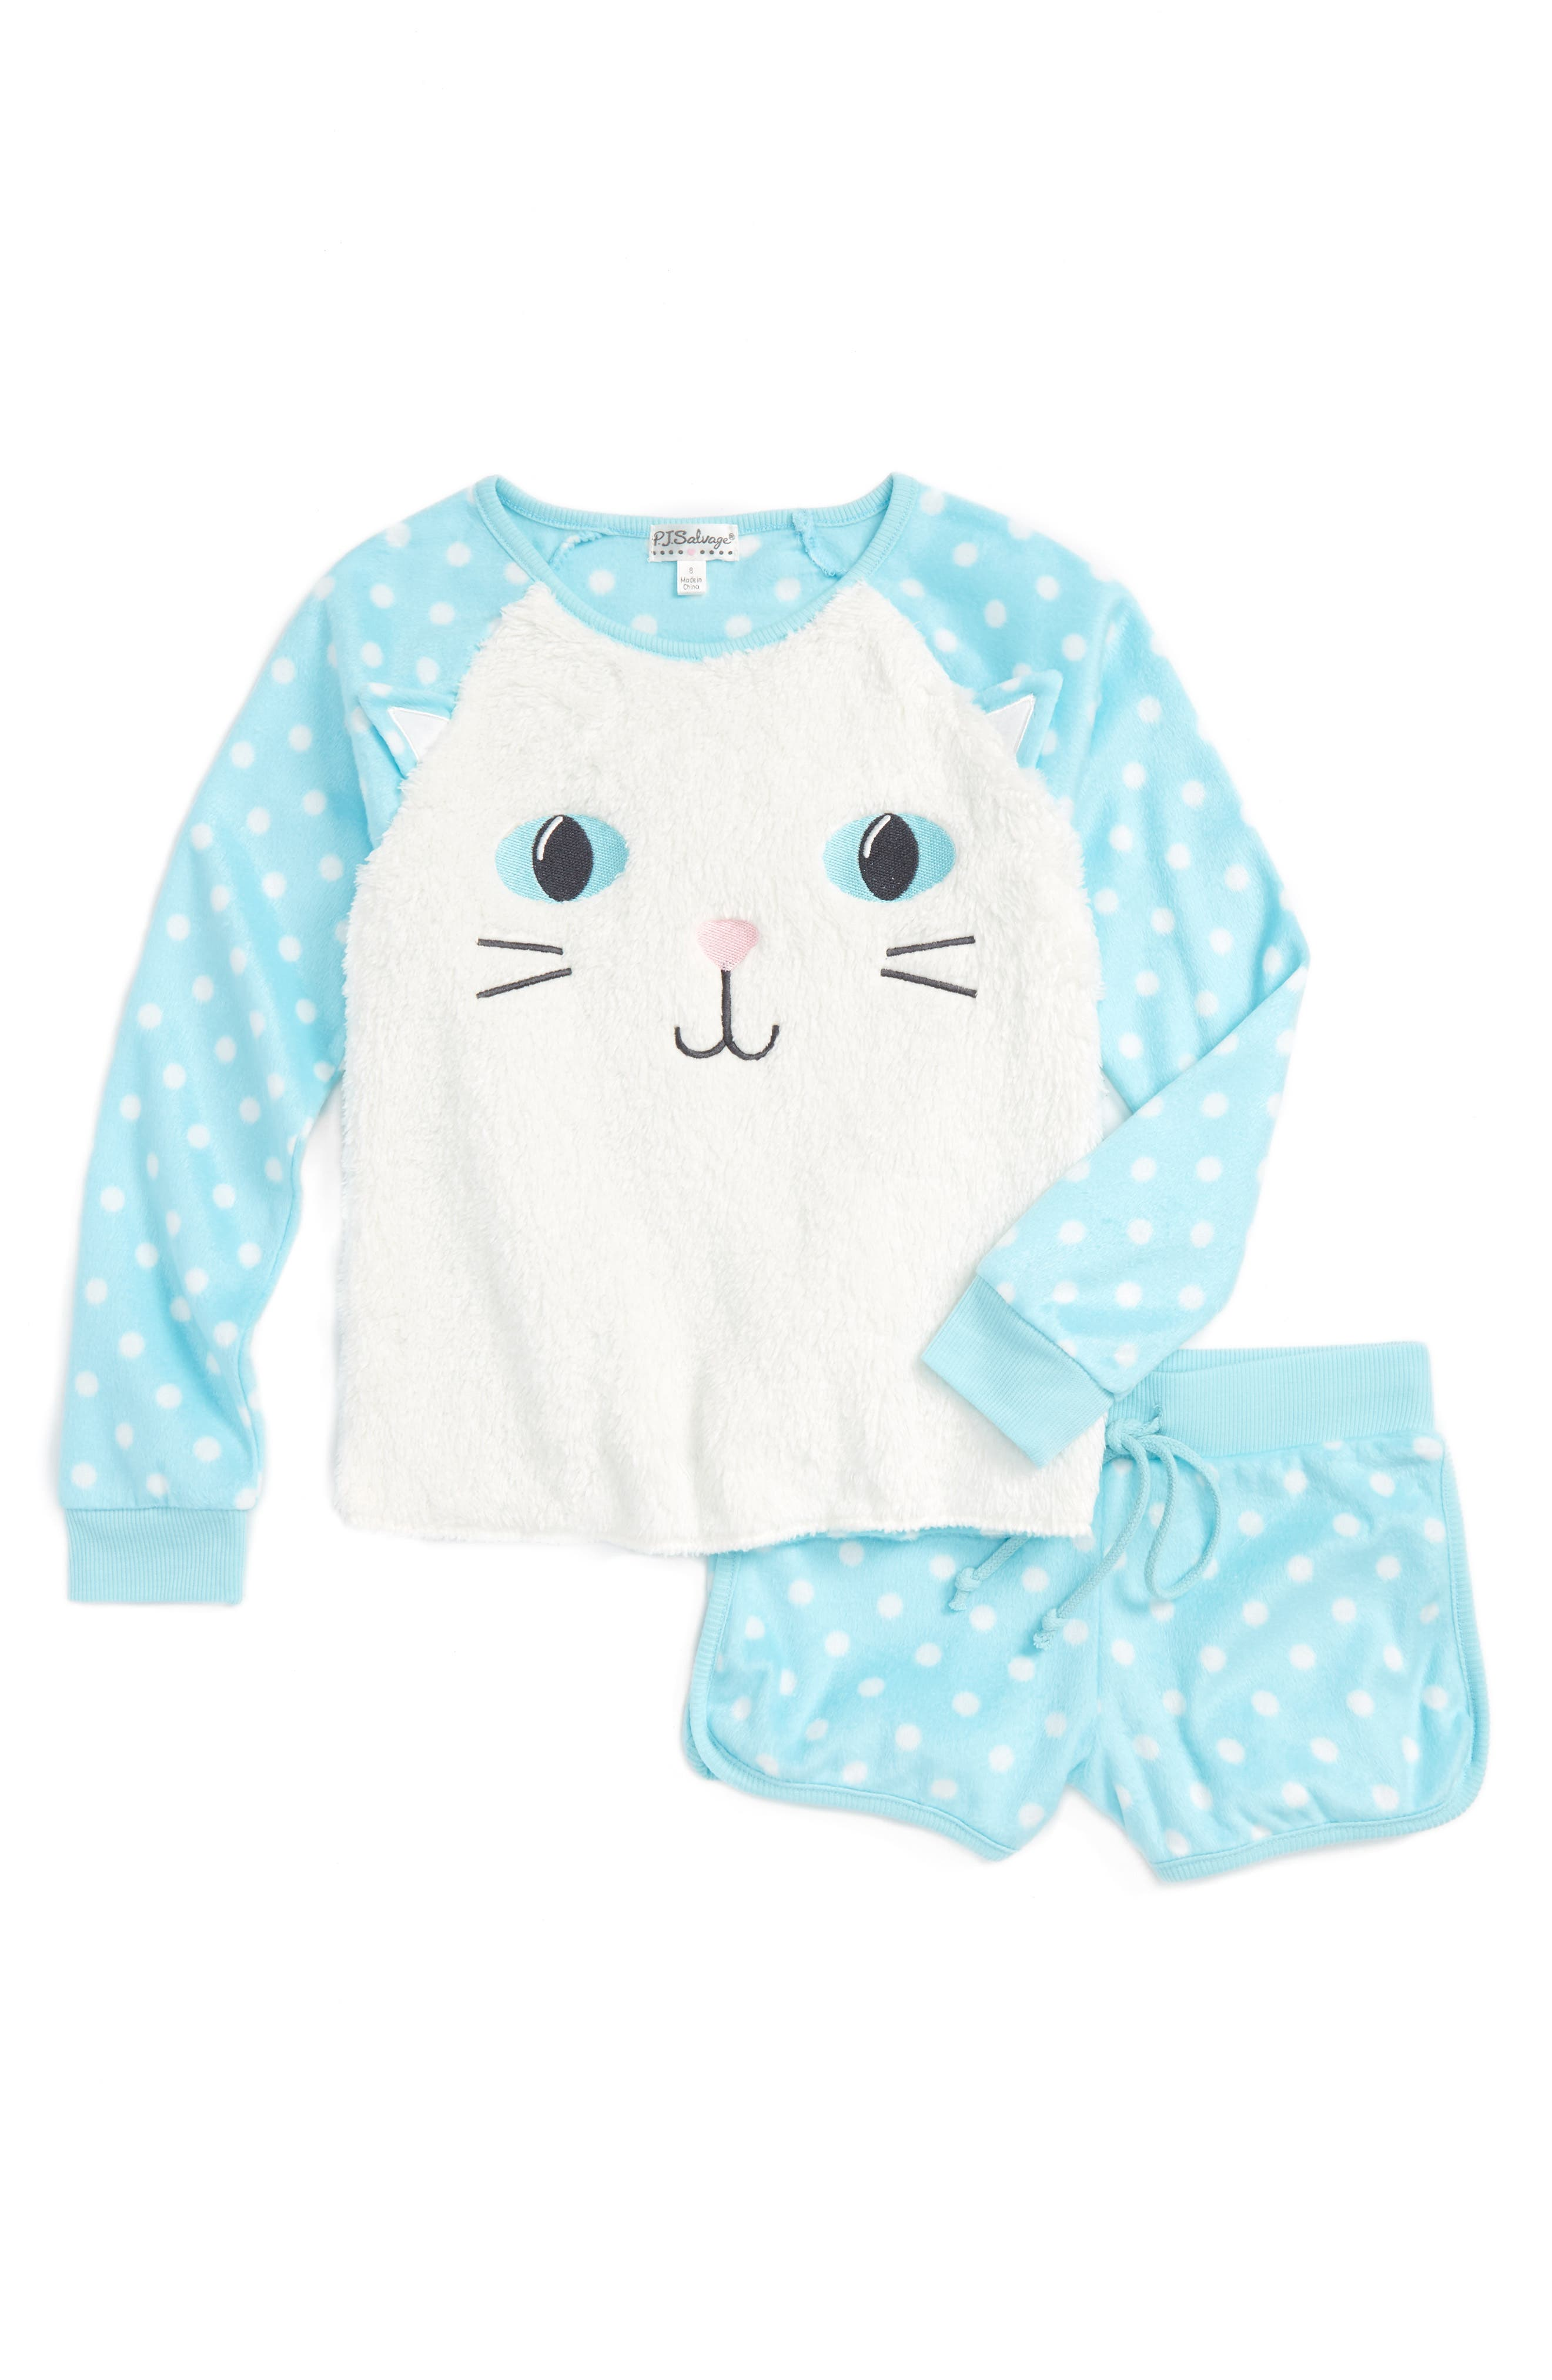 Alternate Image 1 Selected - PJ Salvage Two-Piece Pajamas (Little Girls & Big Girls)